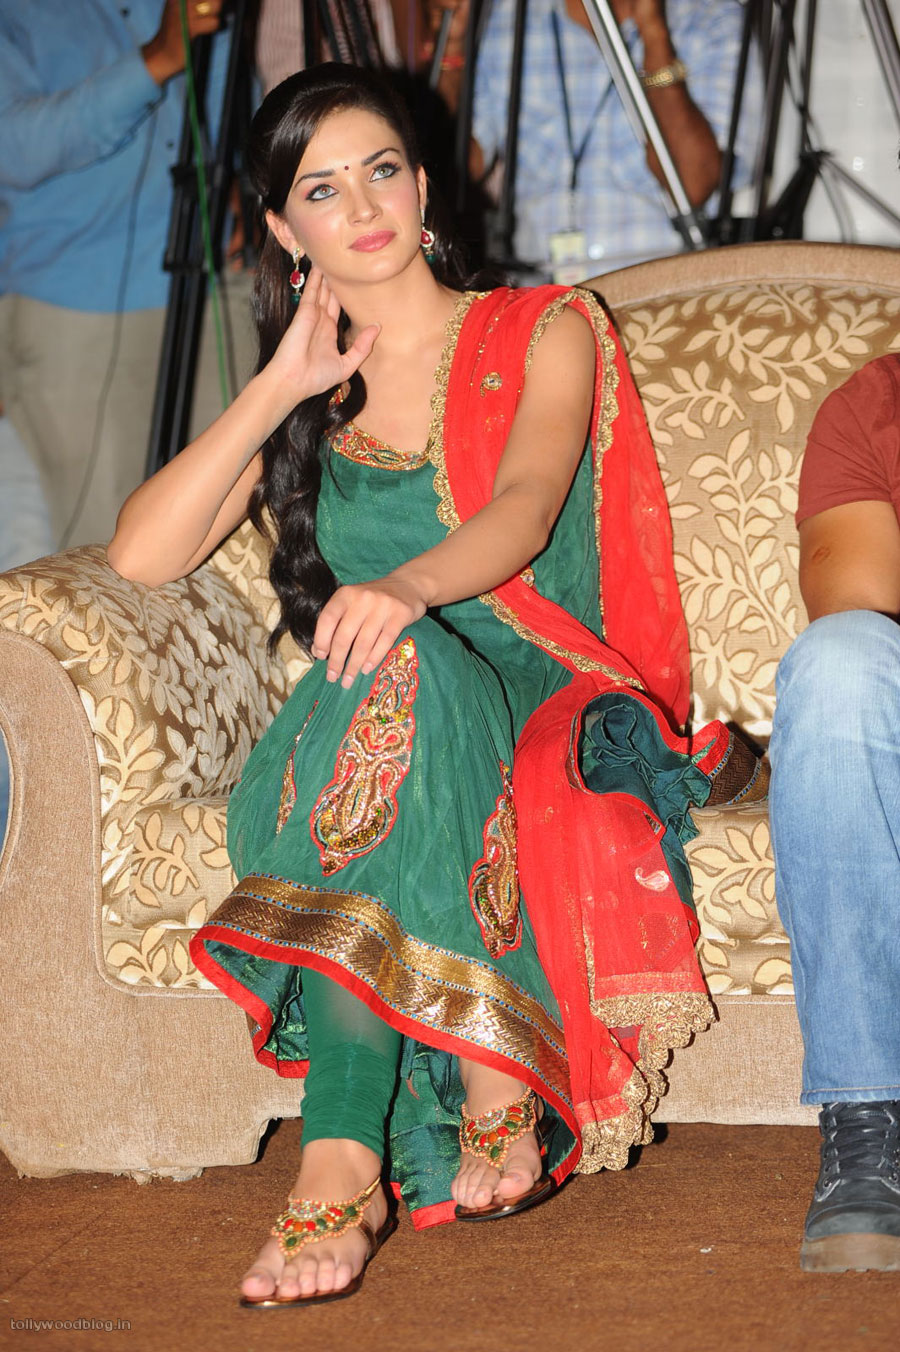 Video Legs Sarayu (actress)  nude (13 images), Instagram, legs